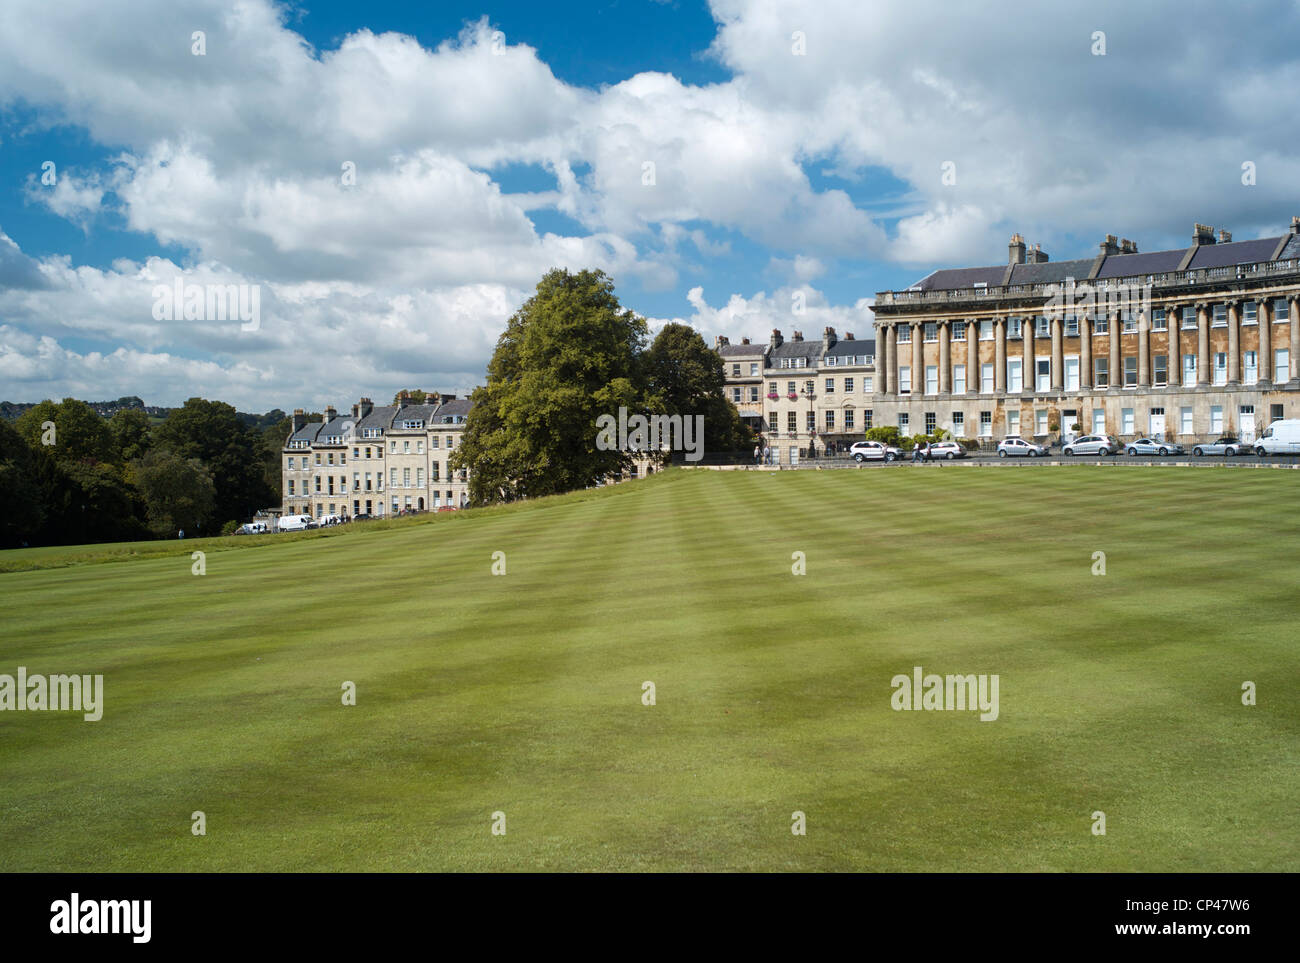 Der Royal Crescent, Bath UK Stockbild